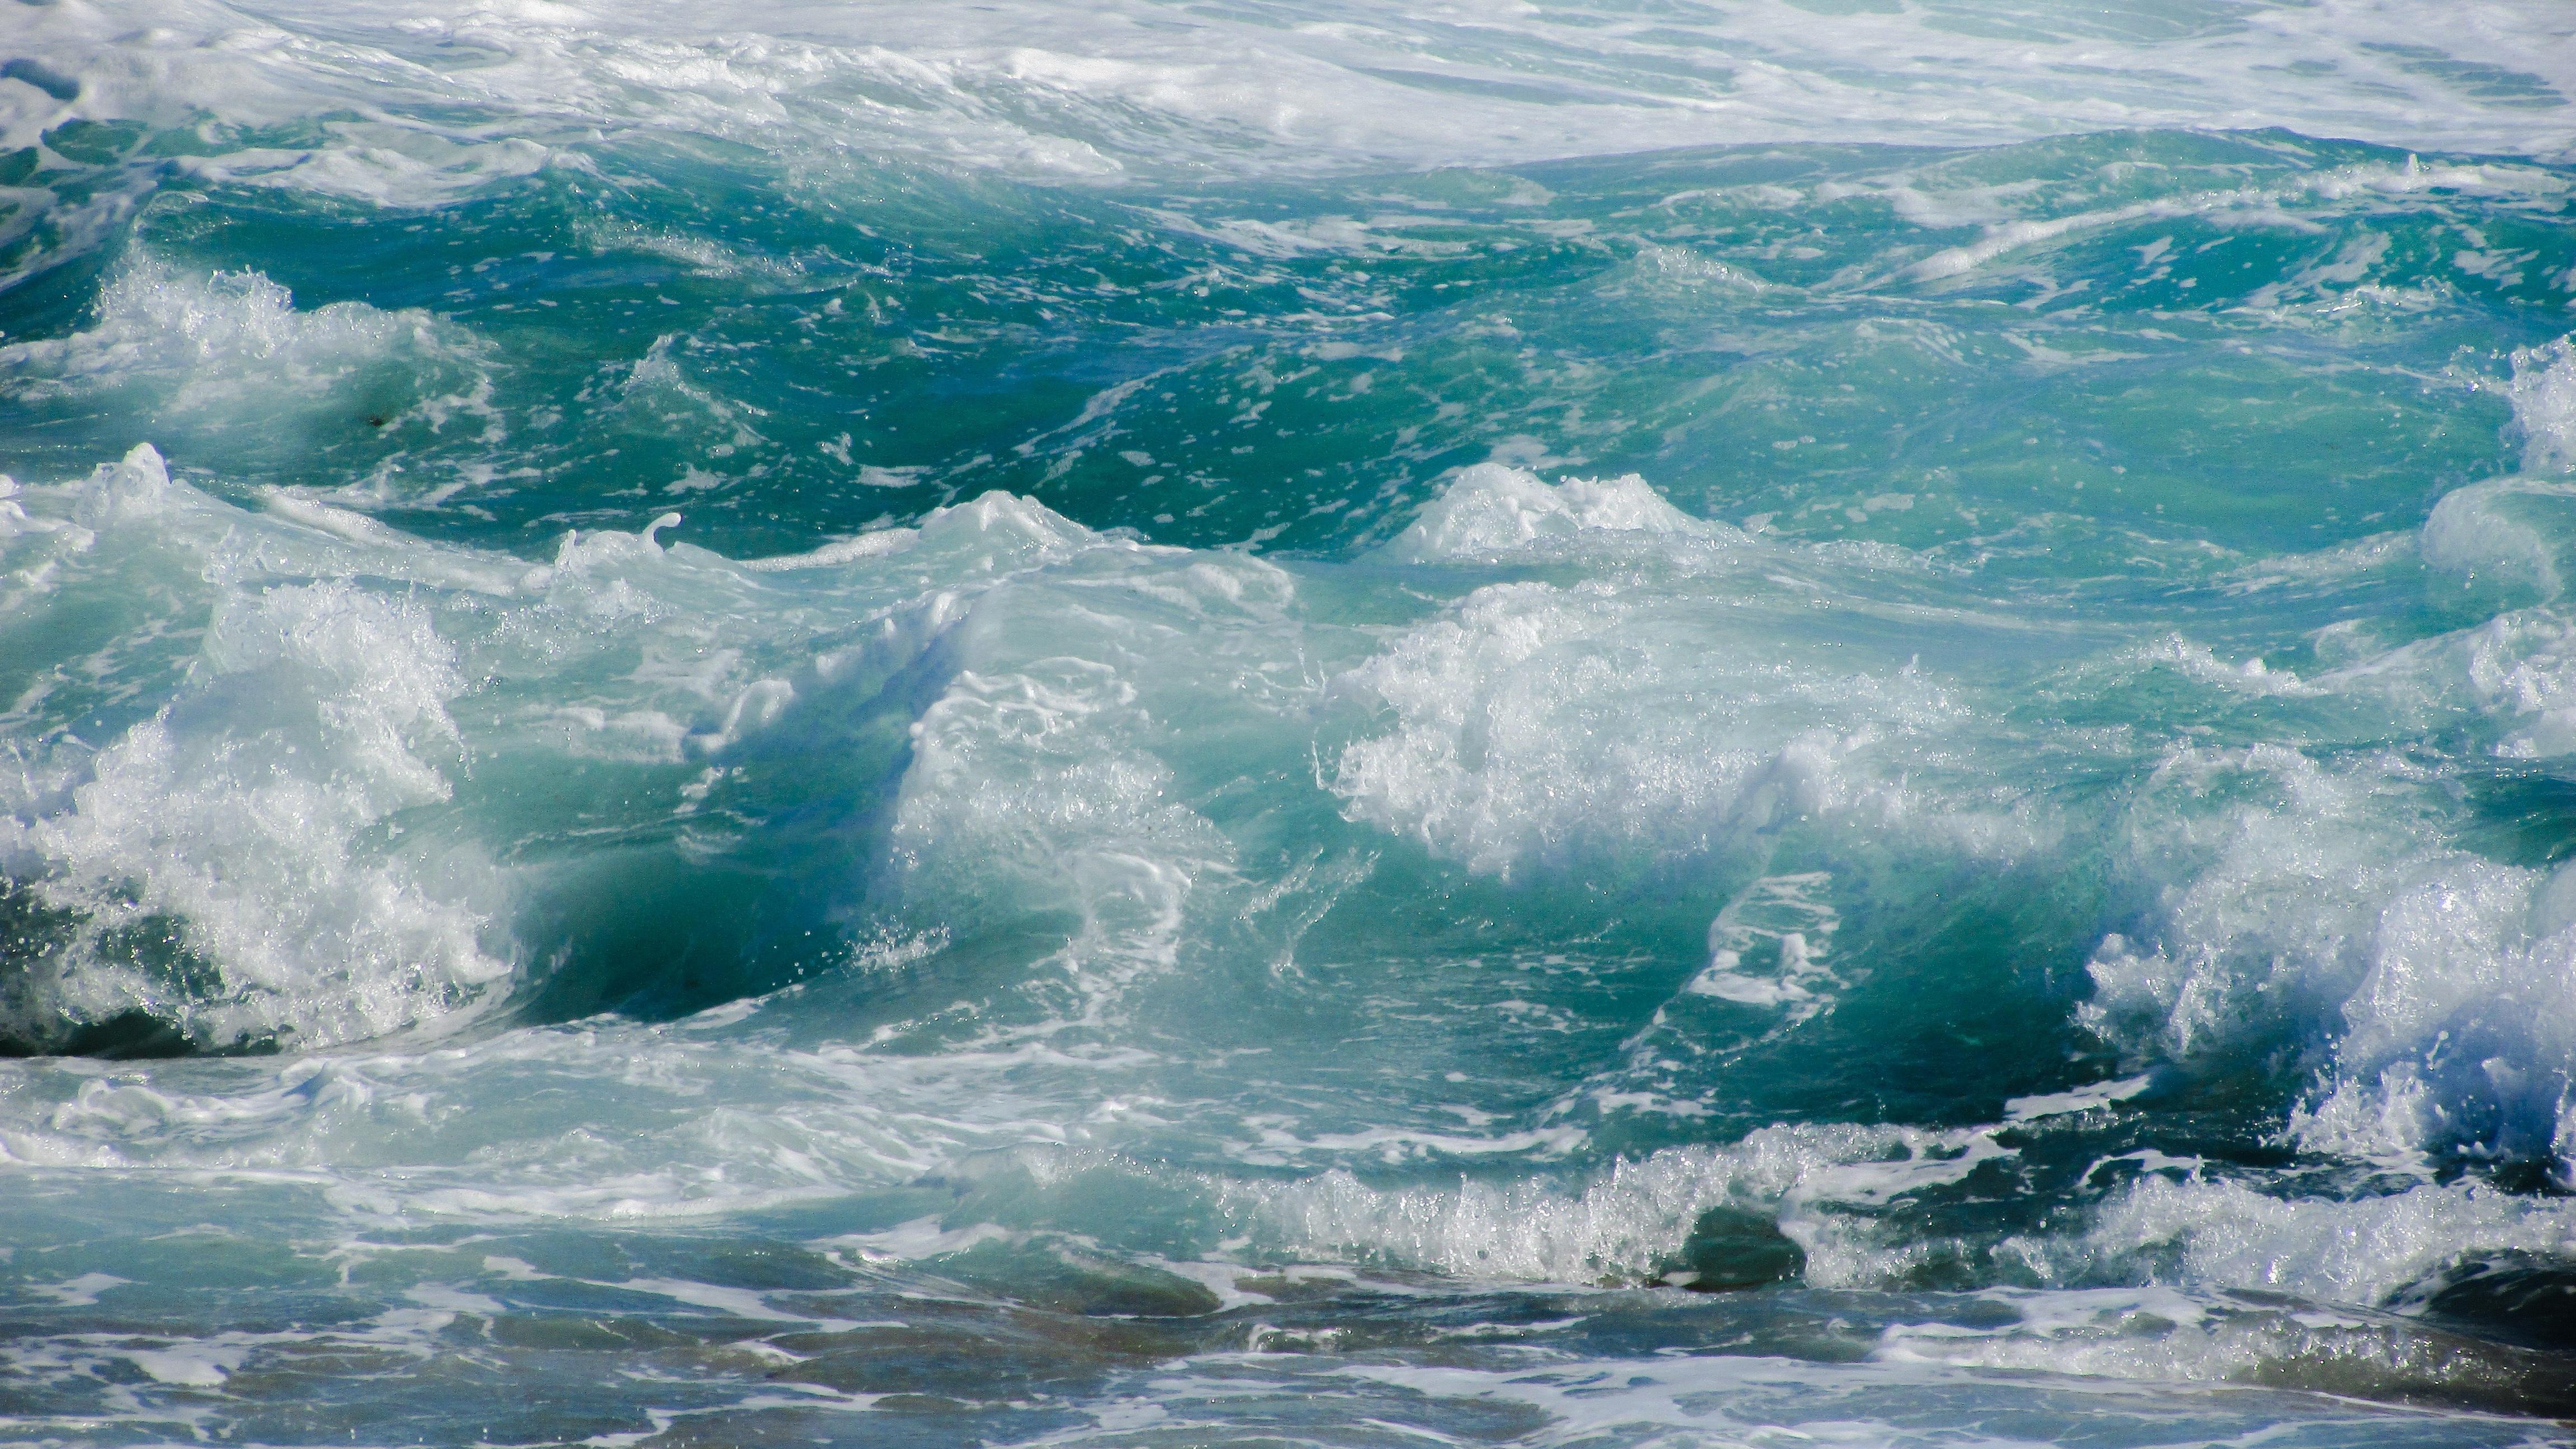 Gratis Billeder Strand Hav Kyst Natur Ocean B 248 Lge